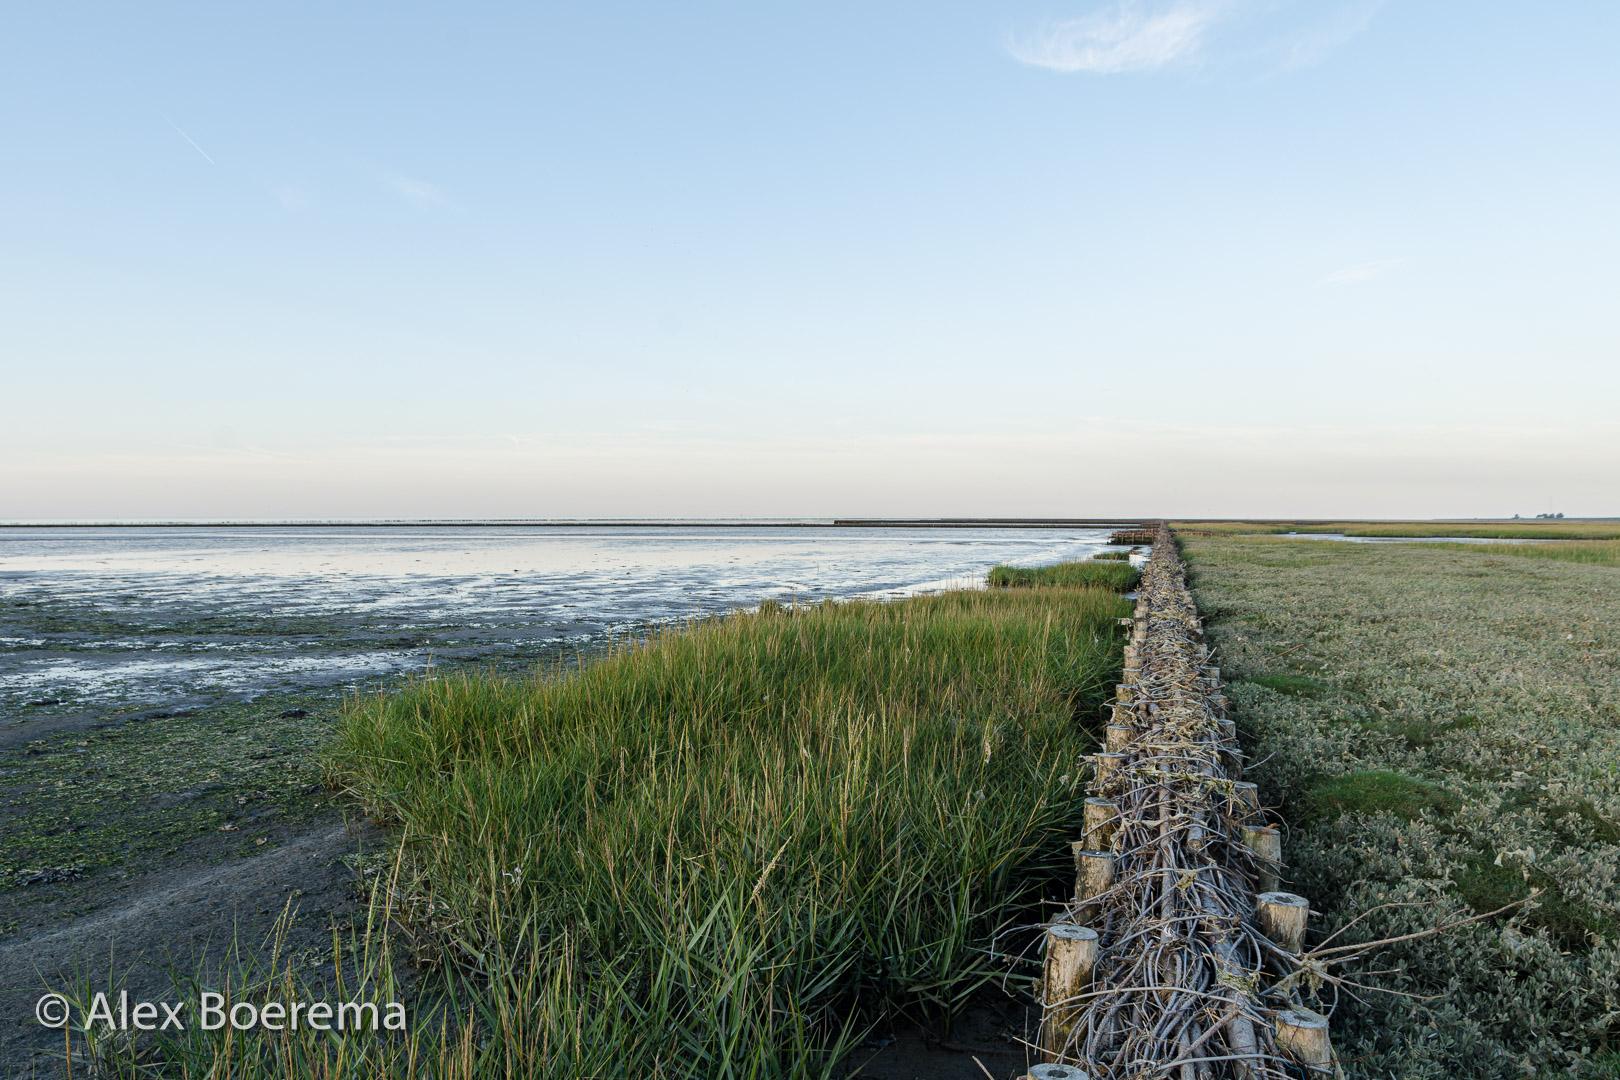 Nieuwe rijsdam september 2019